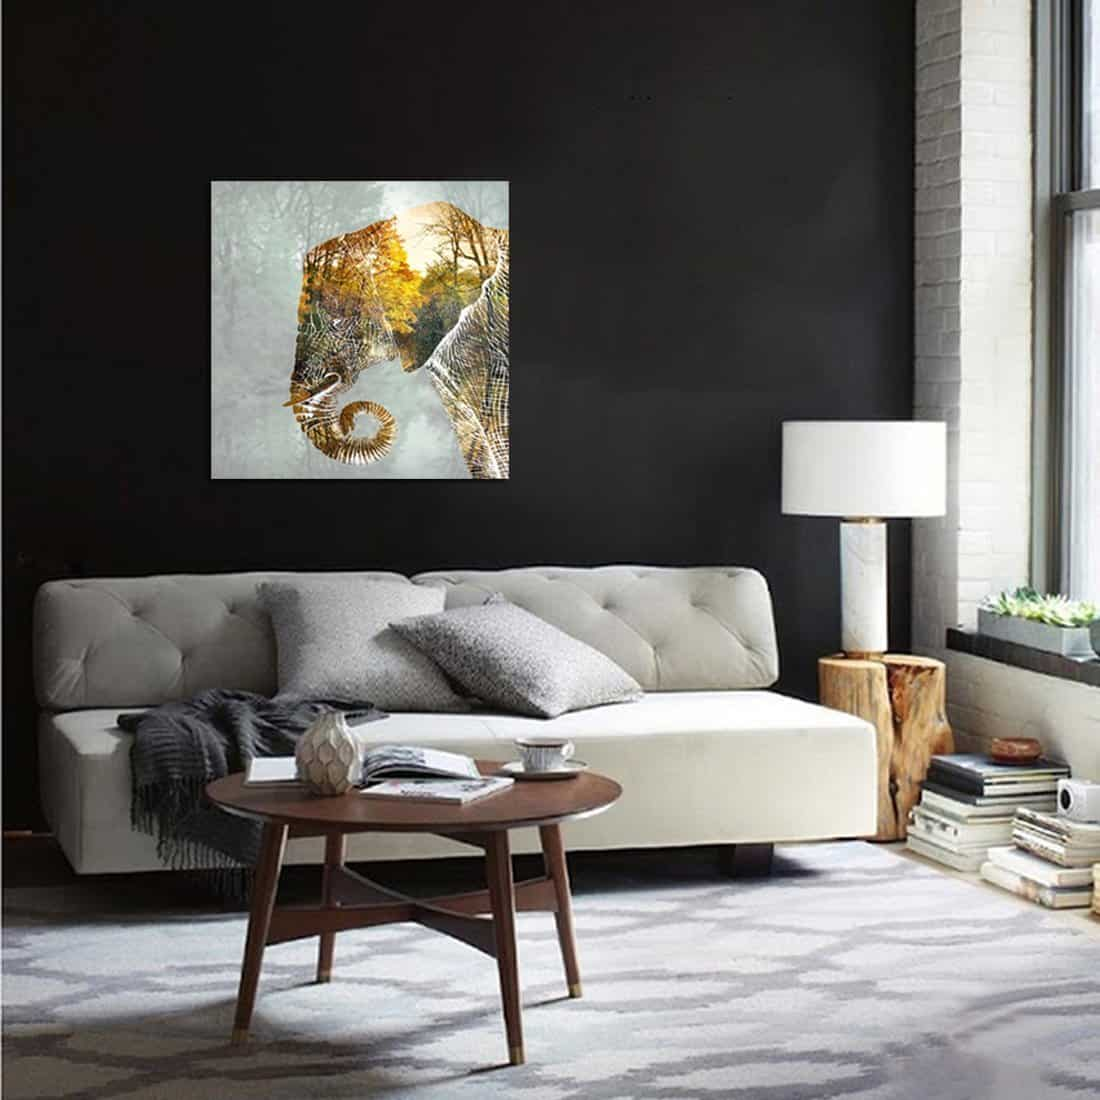 Elephant Living Room Accessories